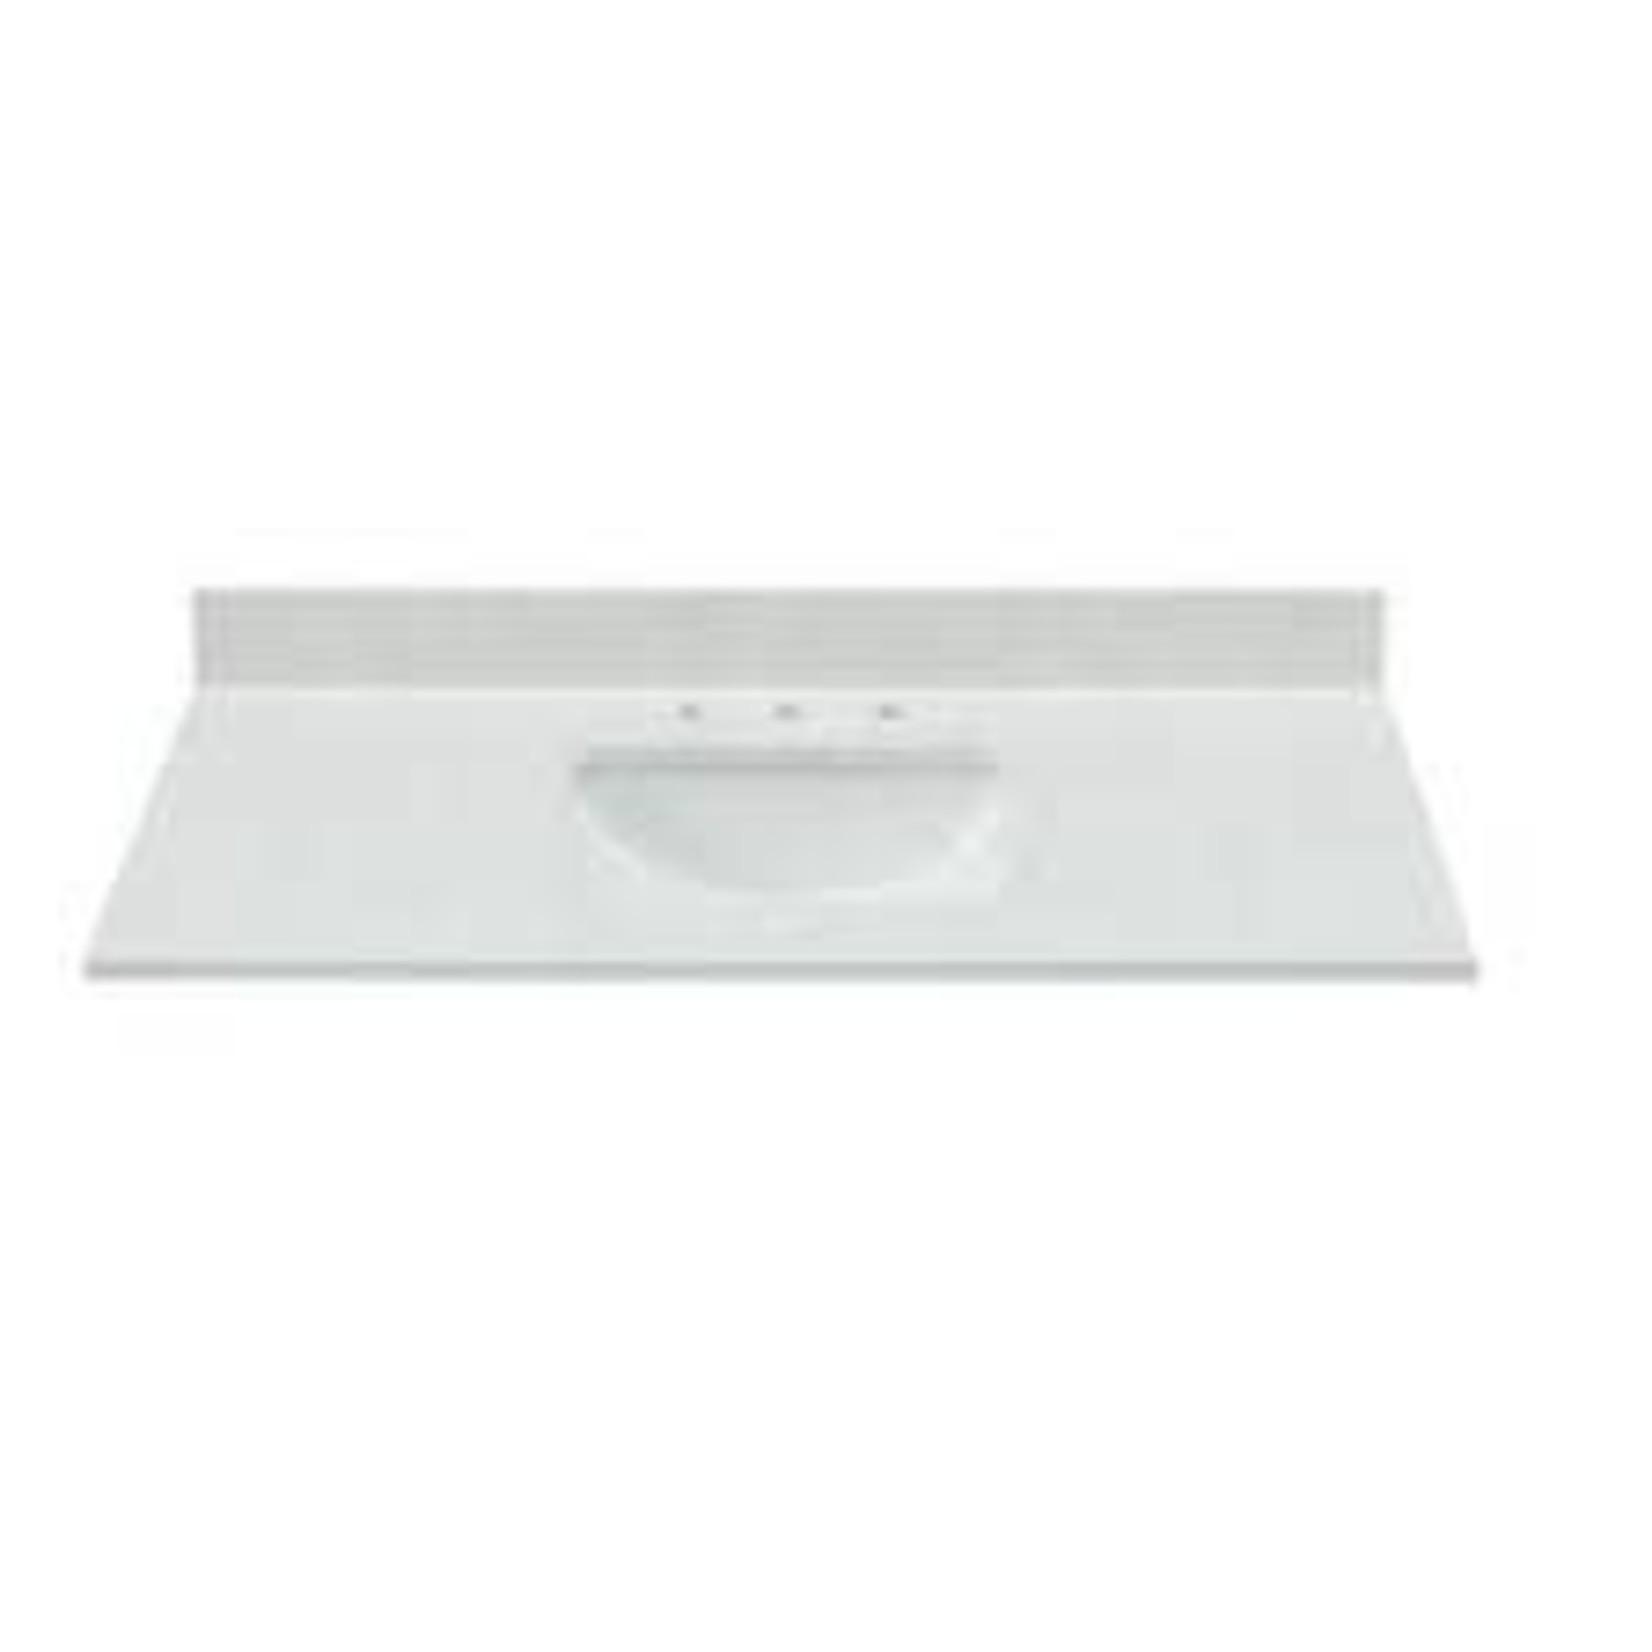 10545 Bestview Vanity Top White Quartz